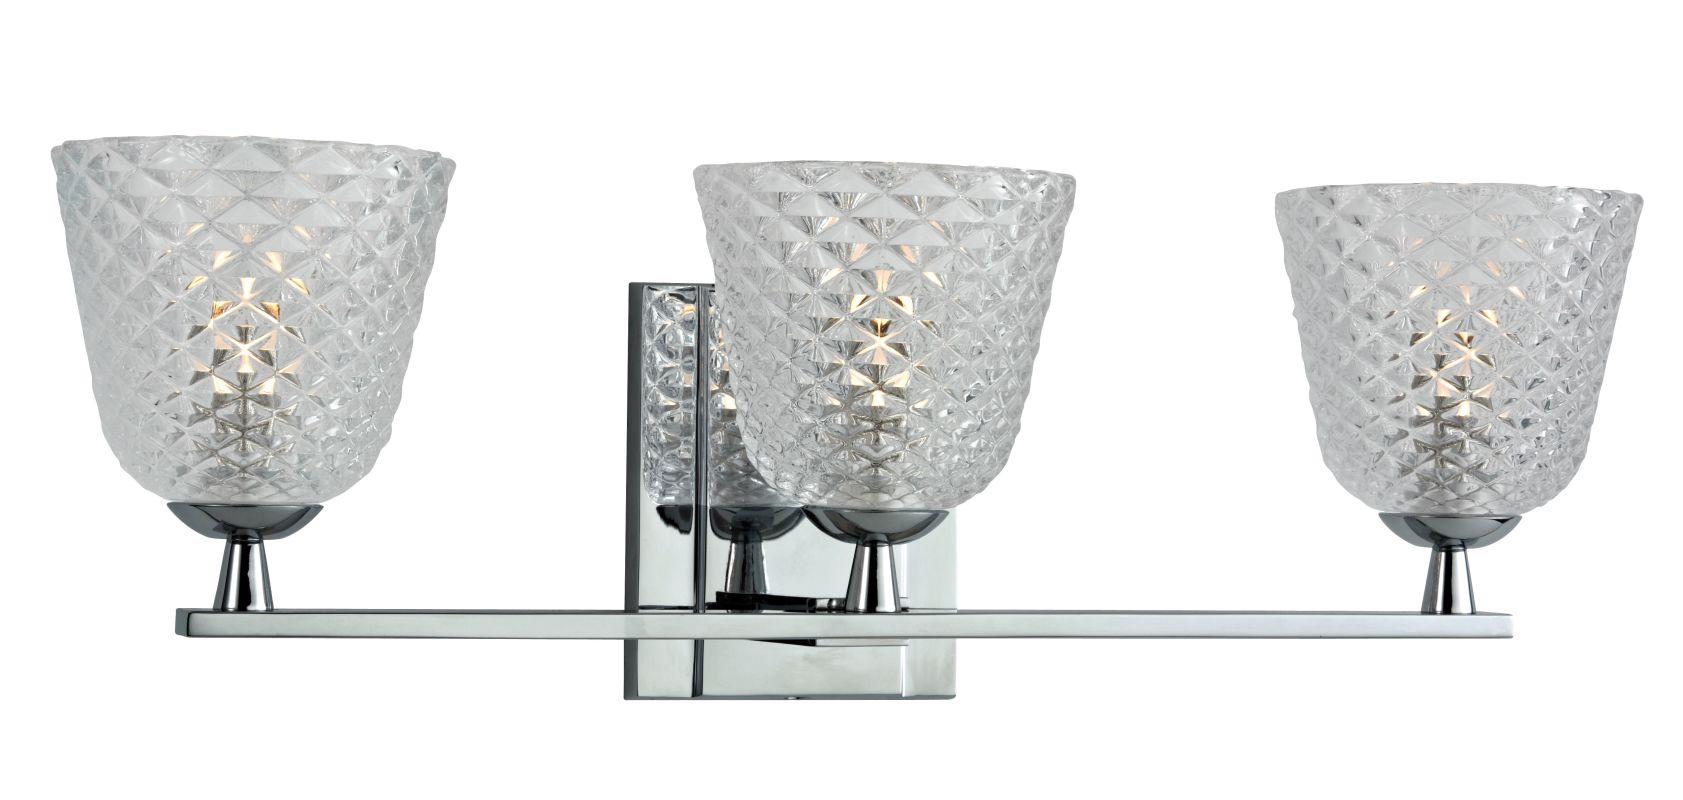 Hudson Valley Lighting 4063 Grafton 3 Light Xenon Bathroom Vanity